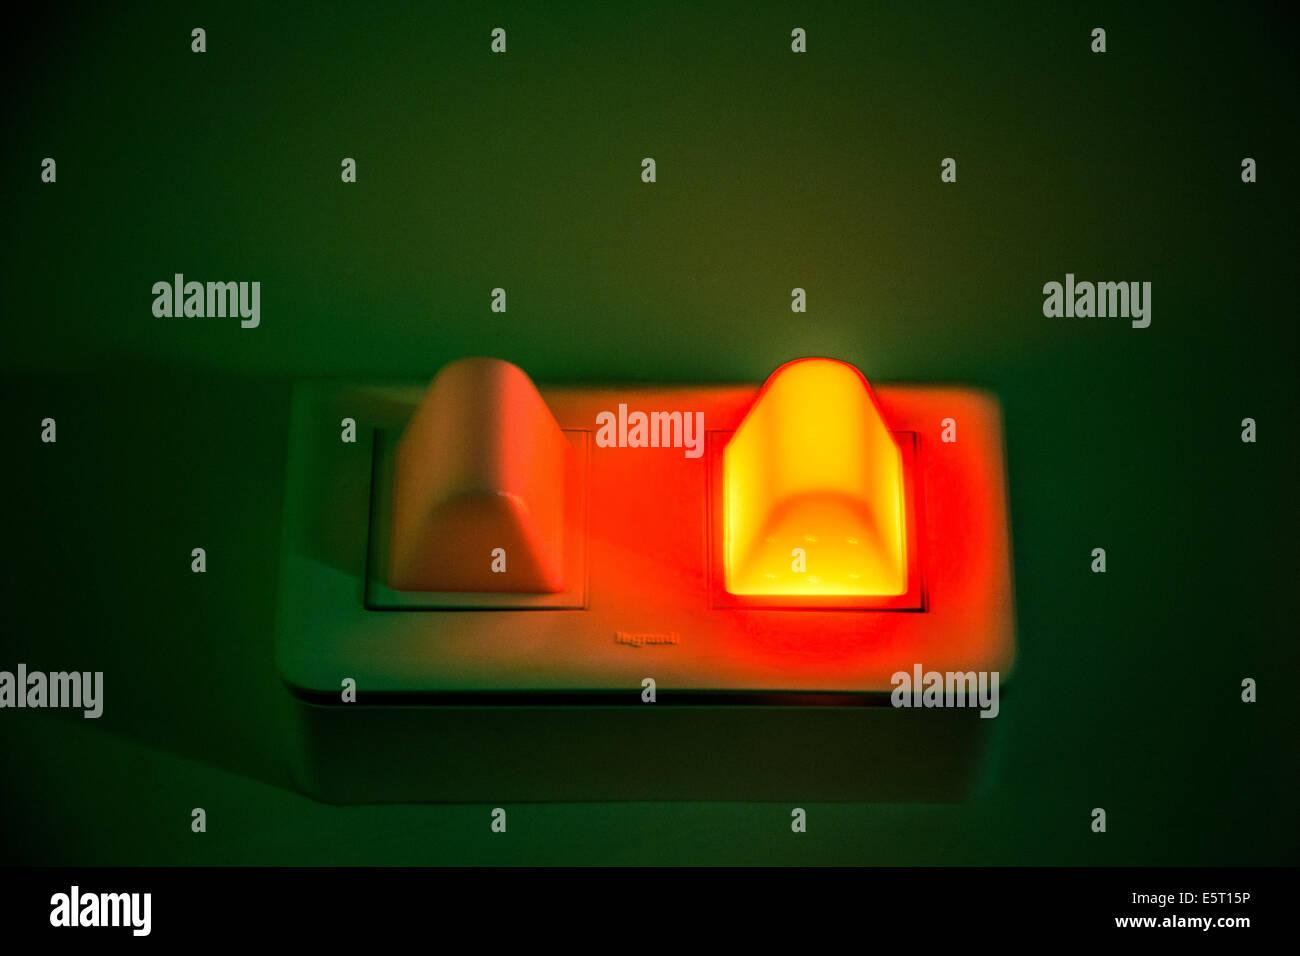 Light signal during a radiology examination. - Stock Image